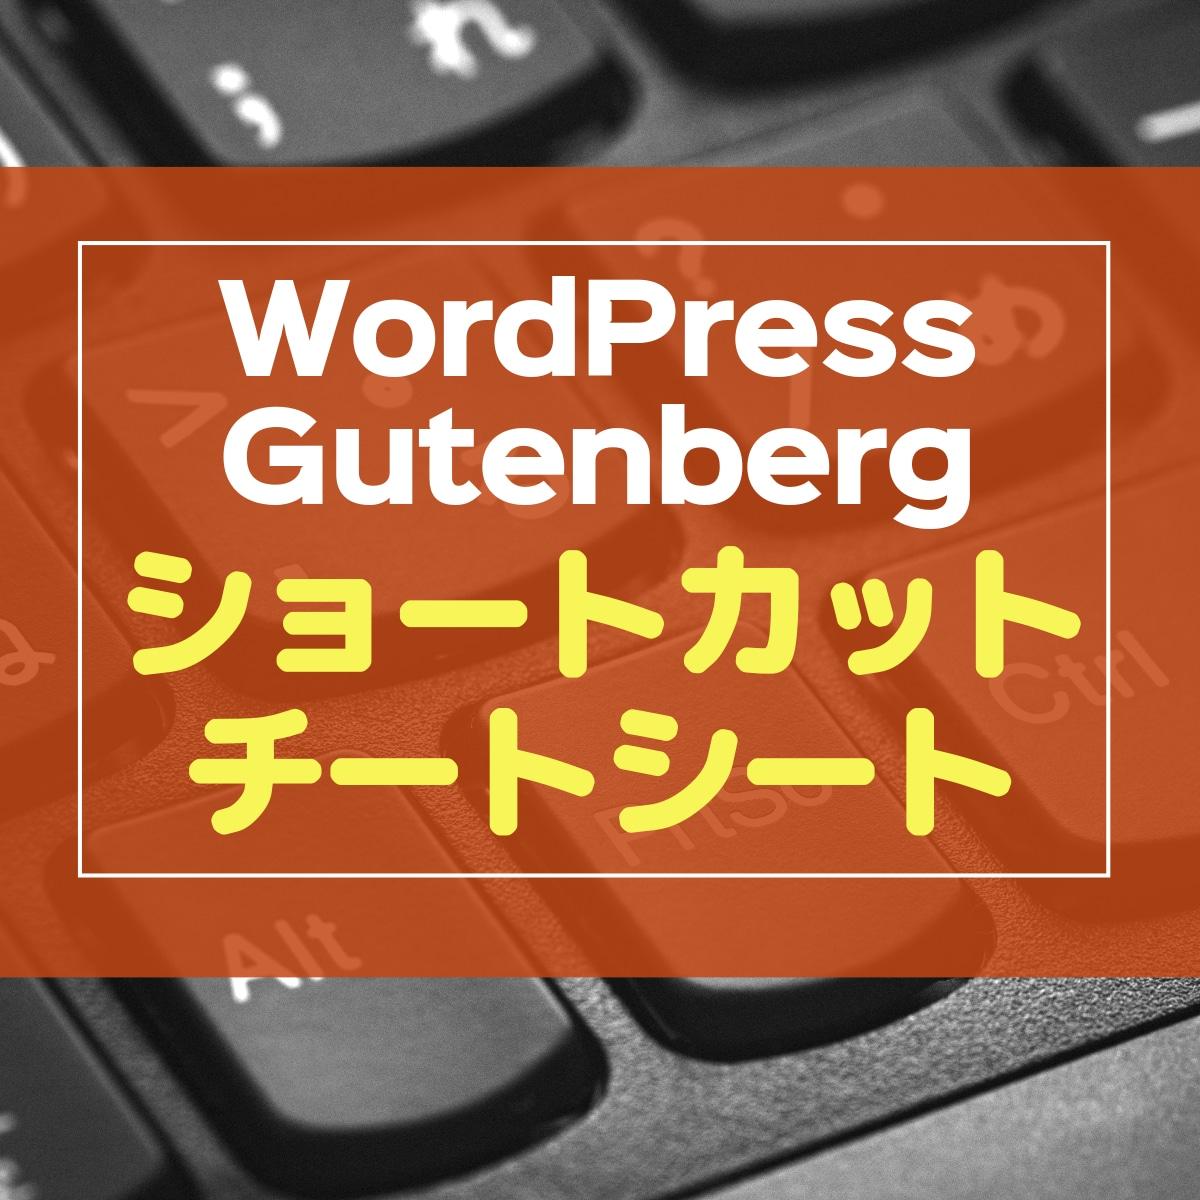 WordPress Gutenberg キーボードショートカット チートシート